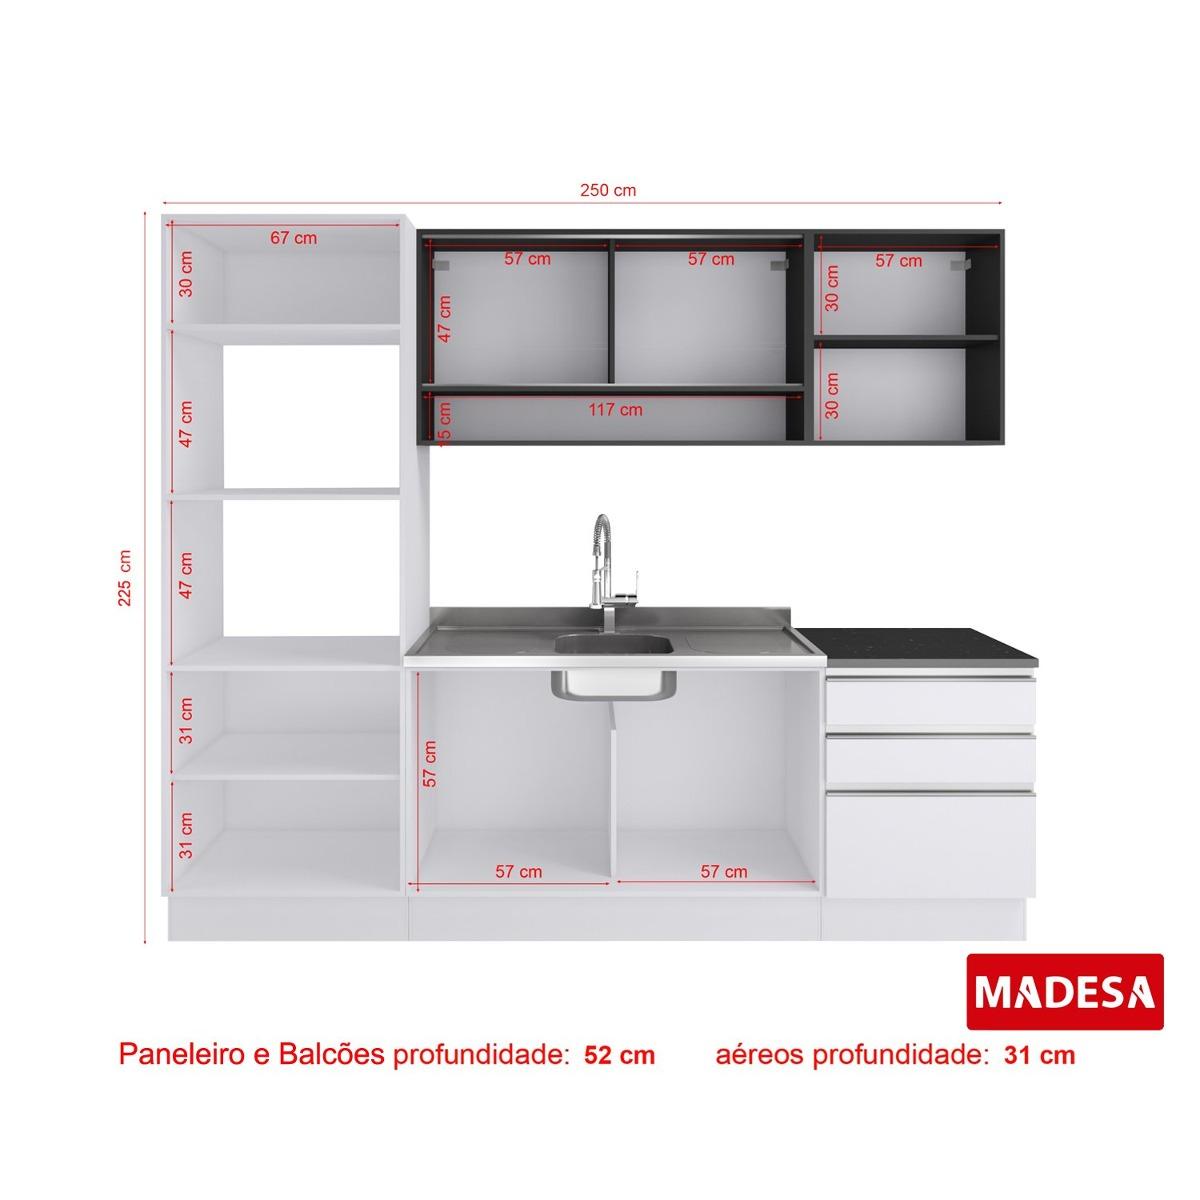 Cozinha Completa Angela Glamy Madesa Branco Preto Ciwt R 1 612